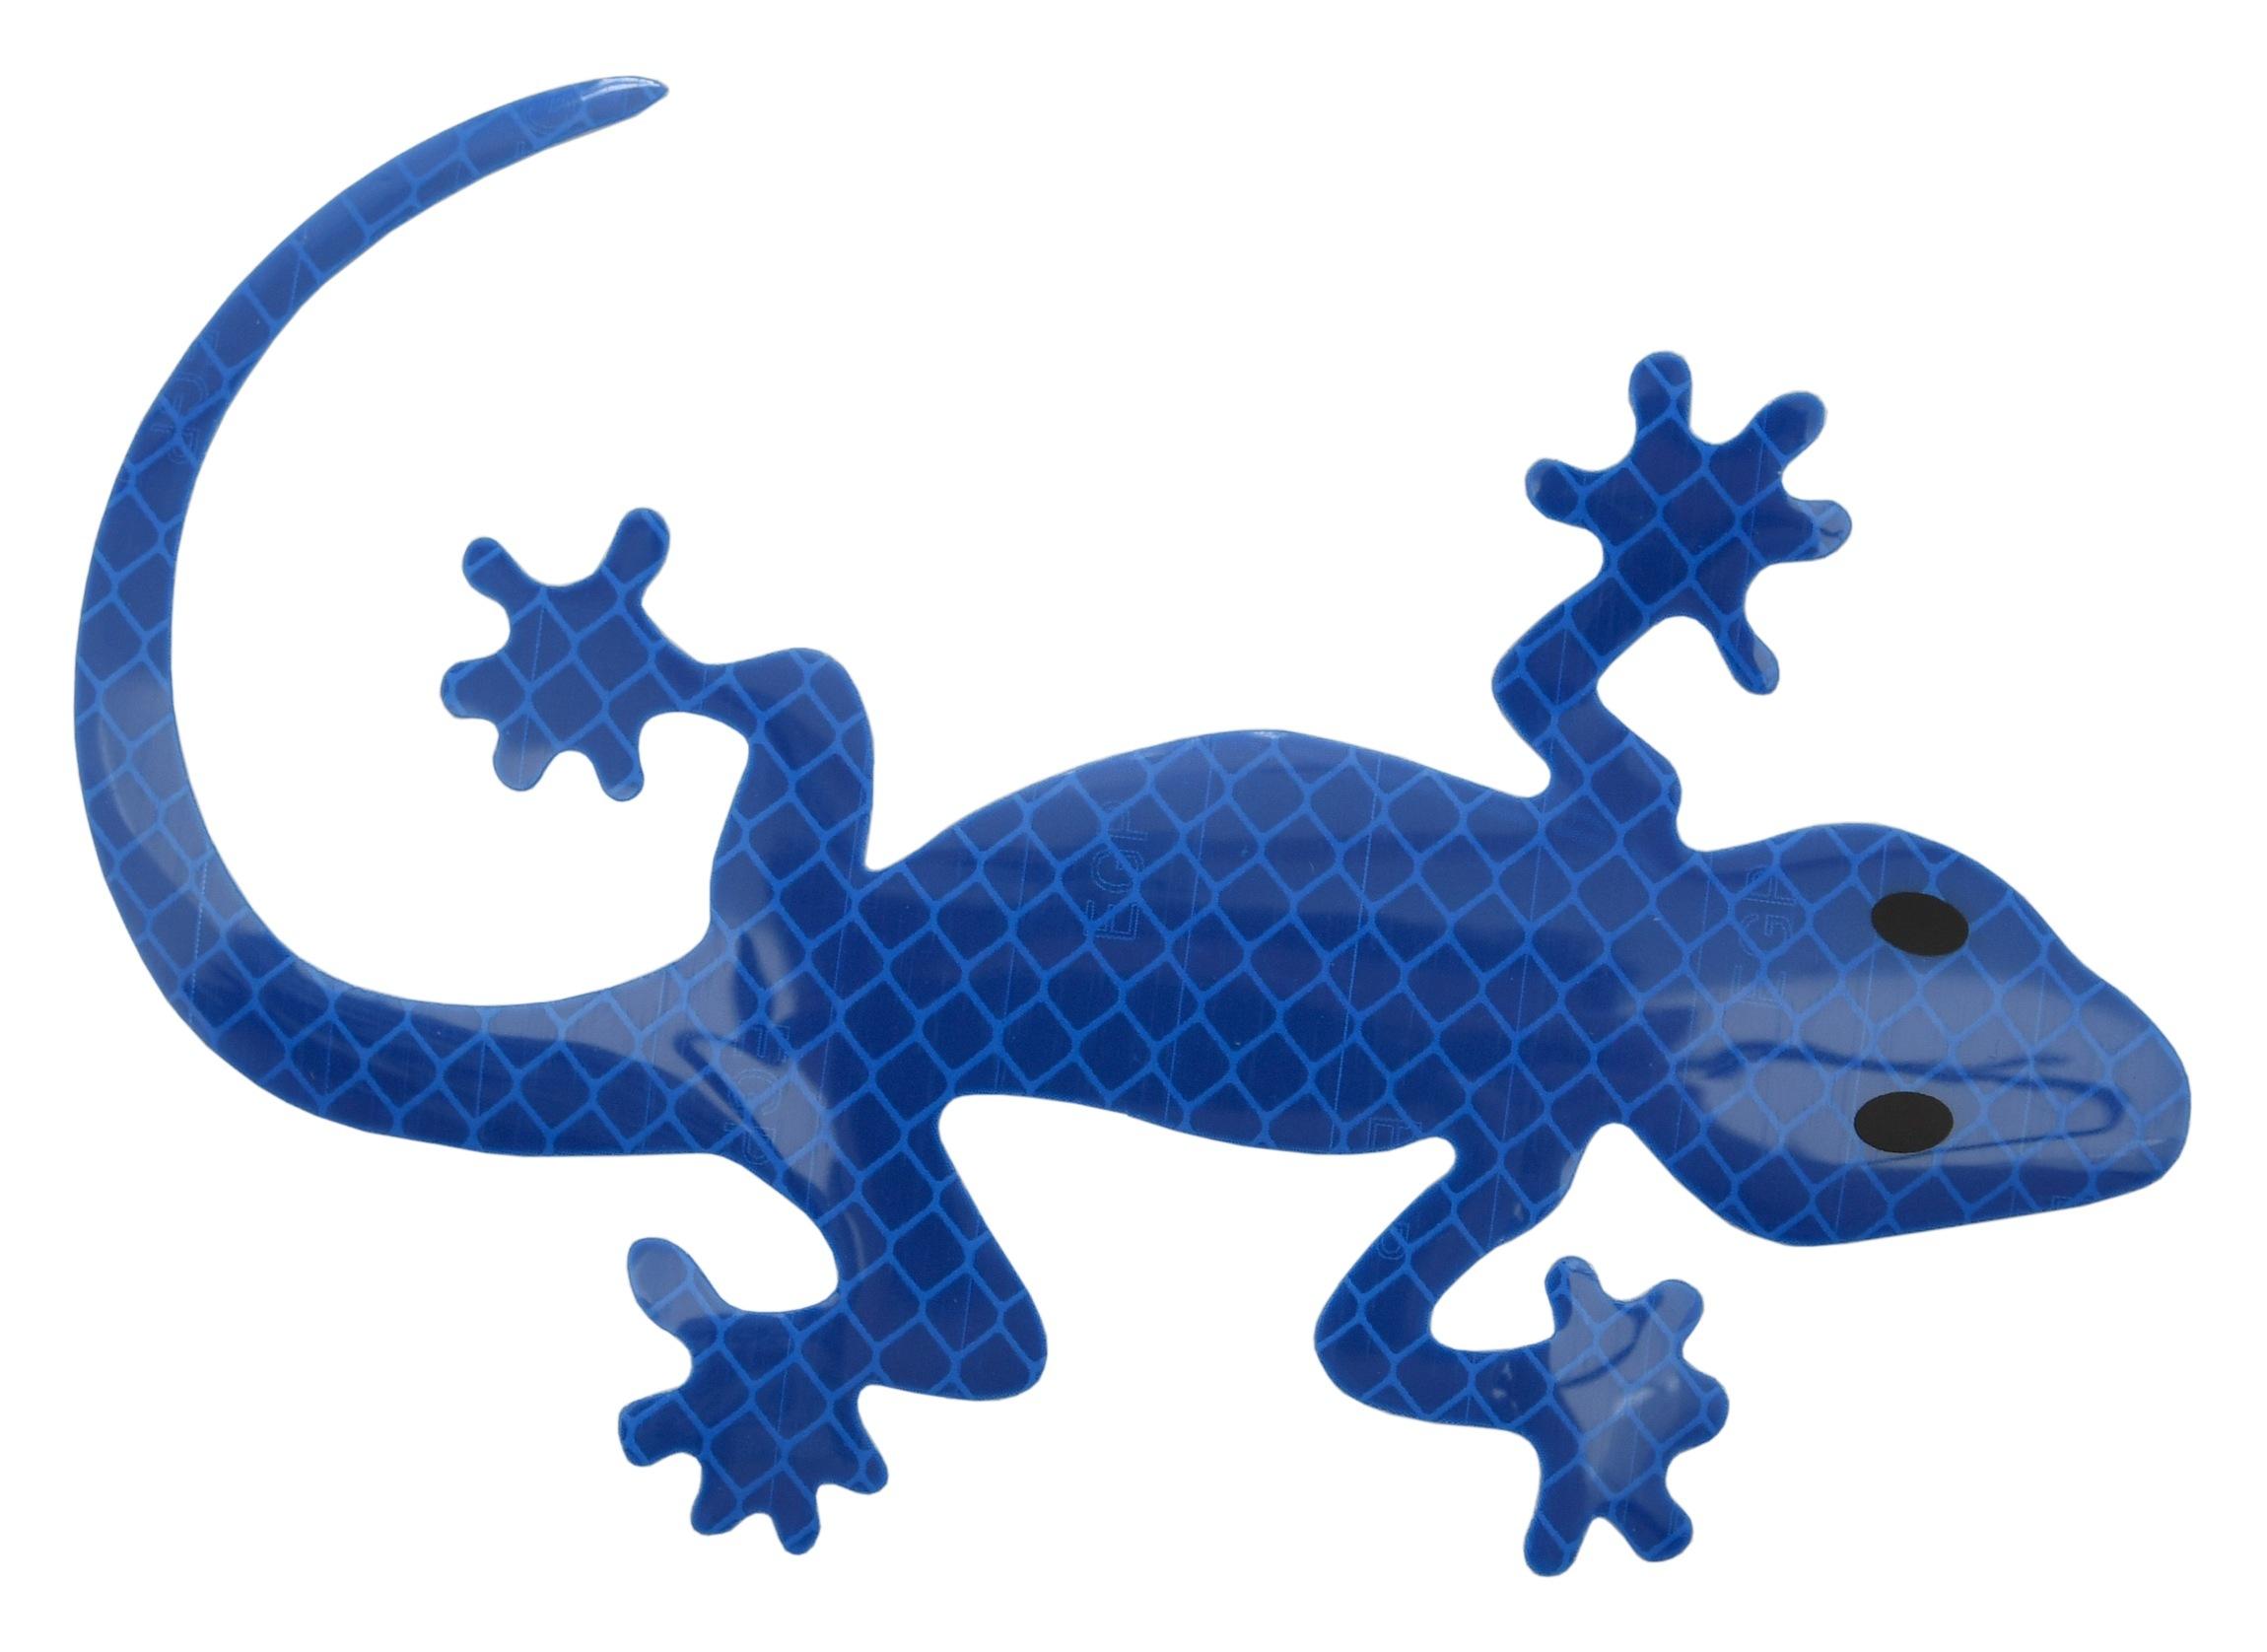 Dekor samolepící GECKO modrý